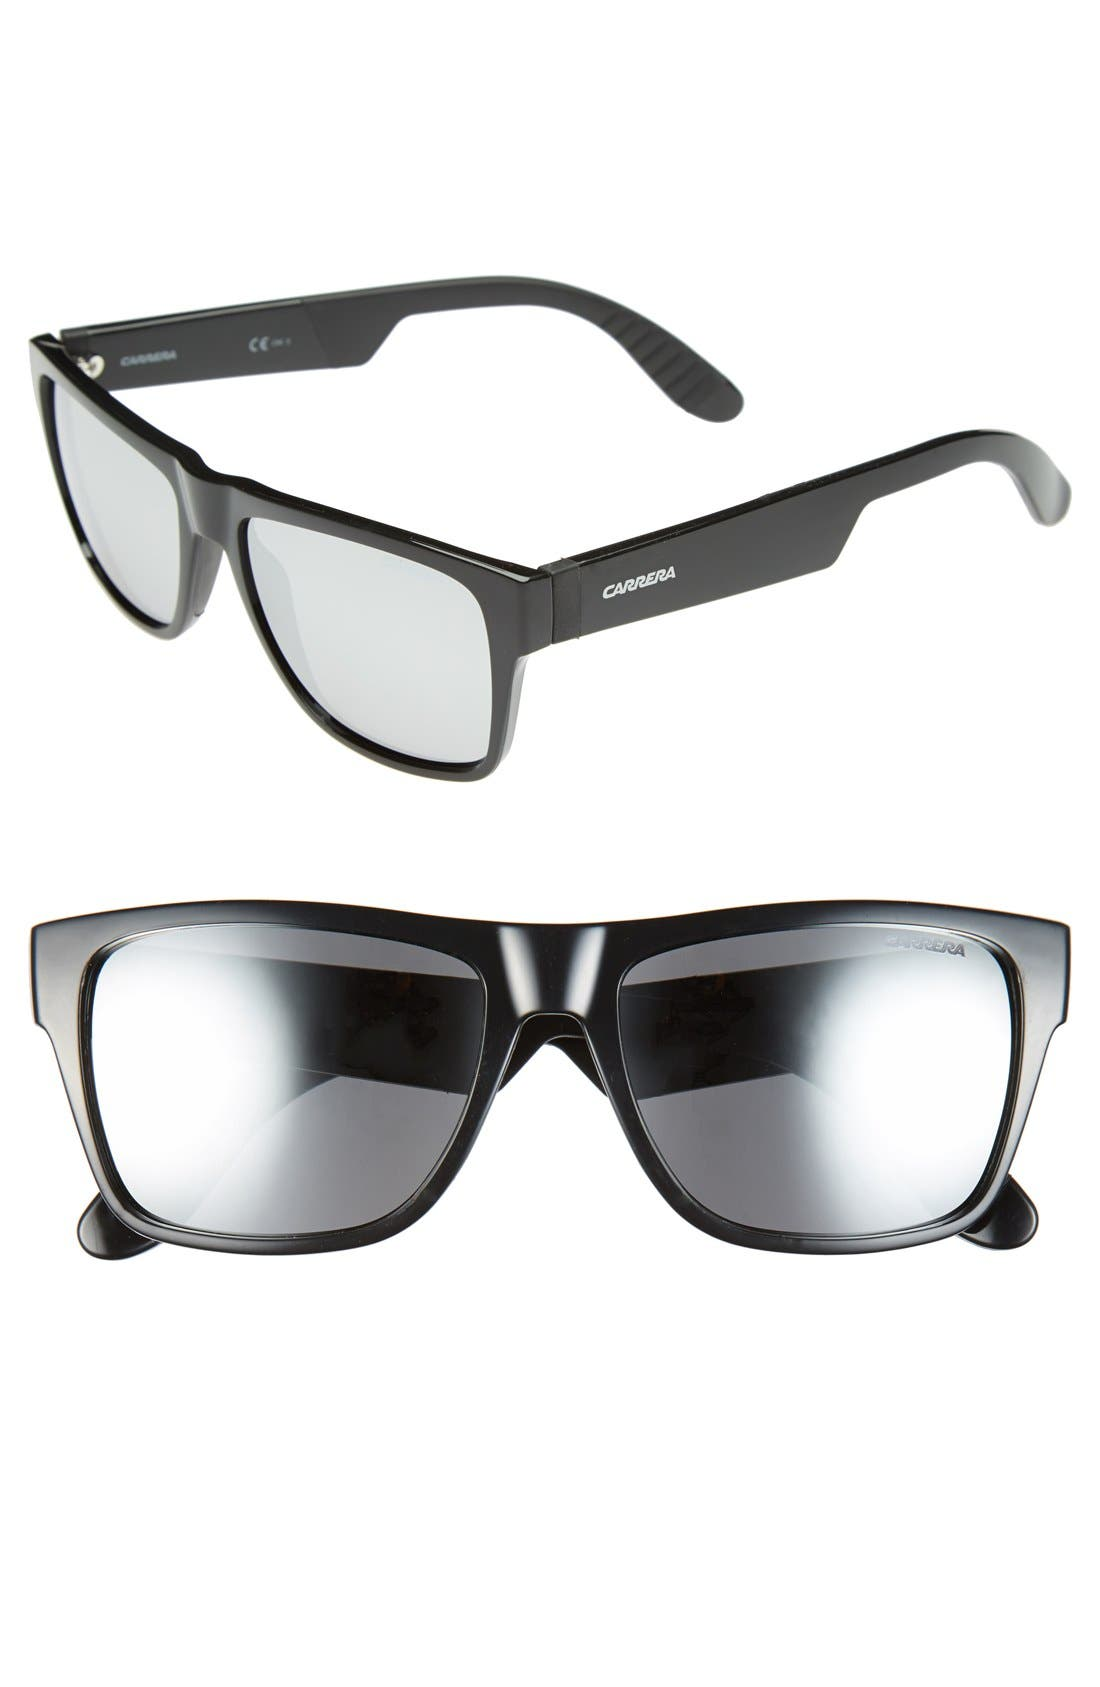 Alternate Image 1 Selected - Carrera Eyewear 58mm Retro Sunglasses